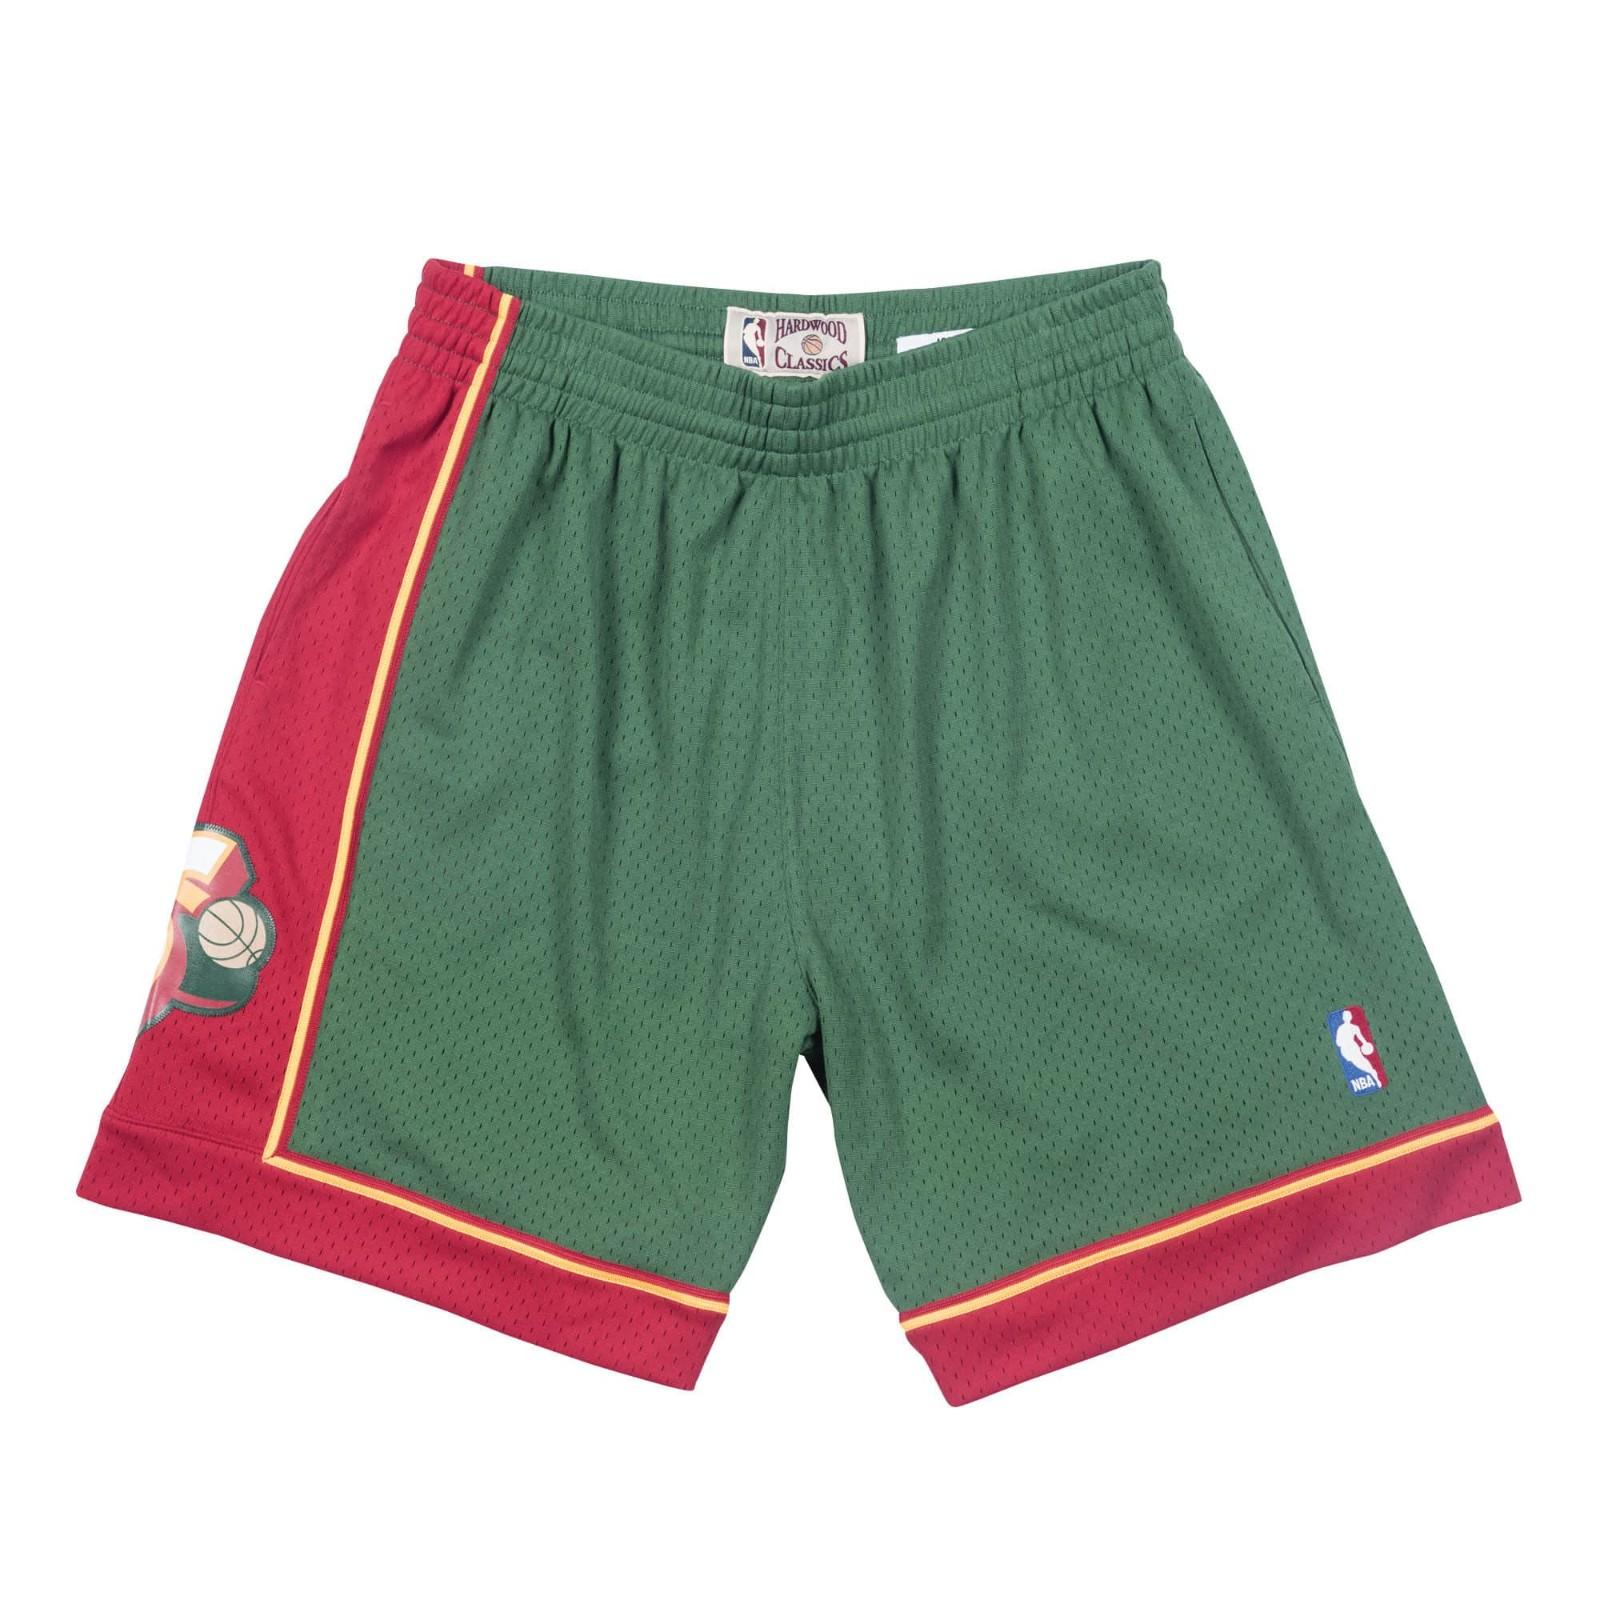 380f87494a7 Seattle Supersonics NBA Men s Mitchell   Ness 1995-96 Road Green Swingman  Shorts